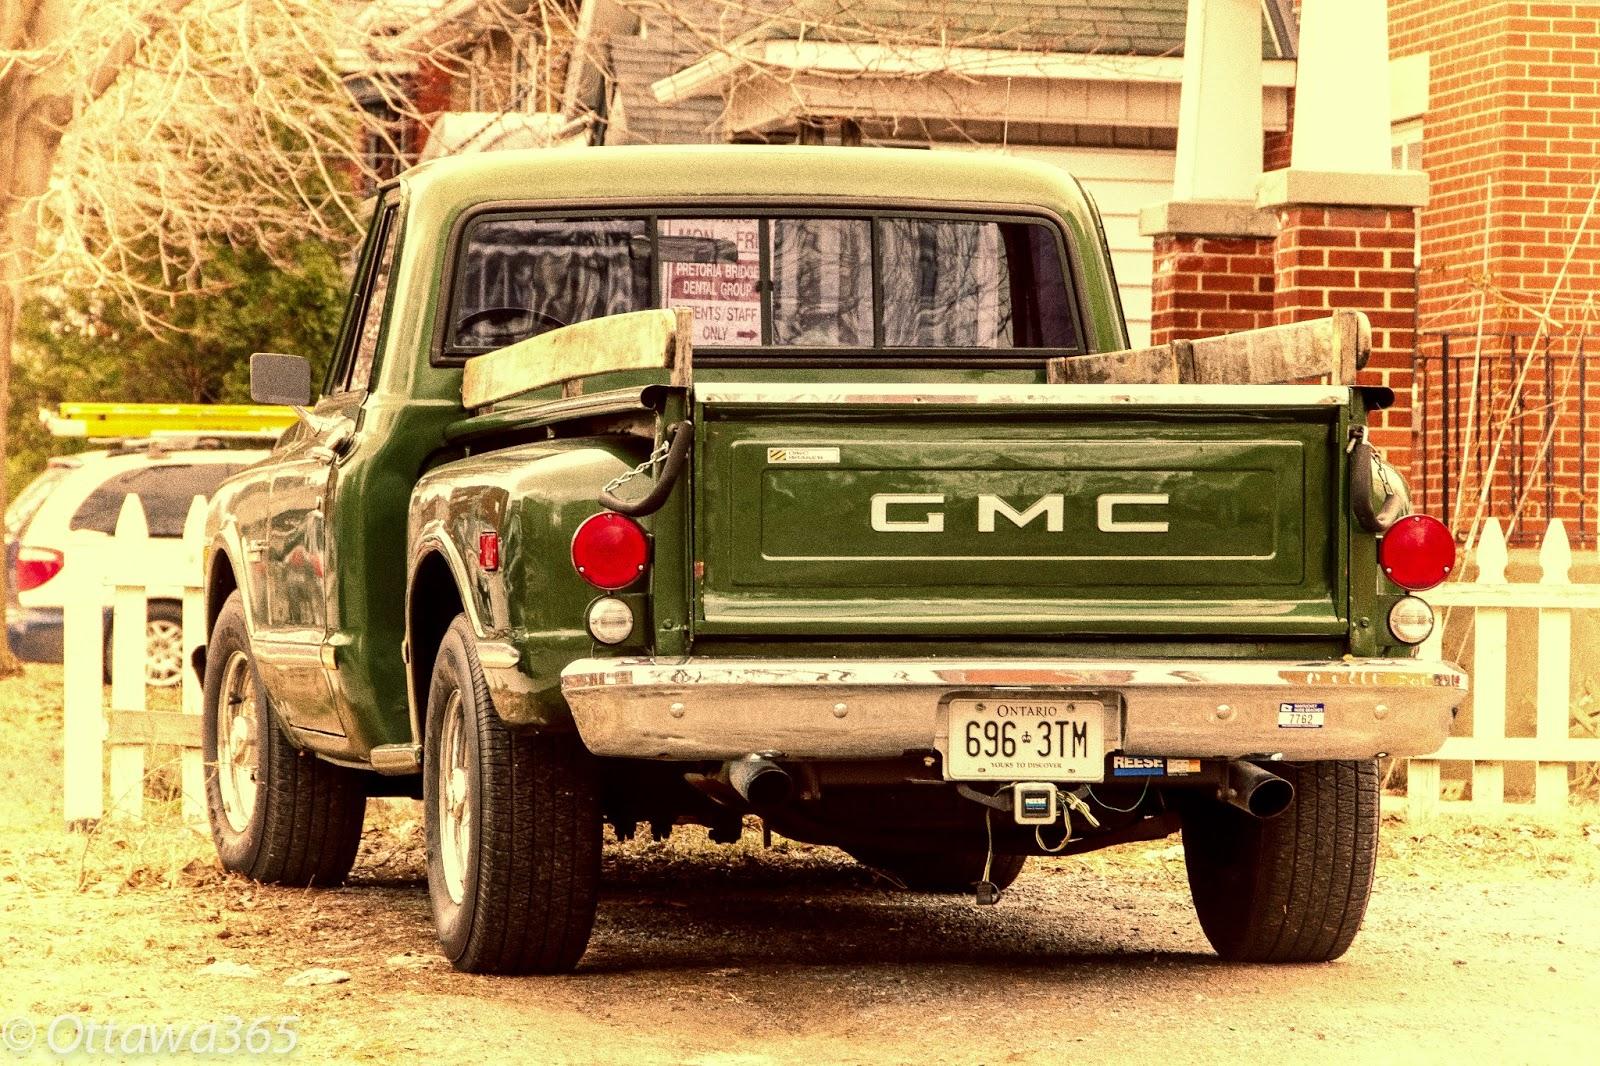 Ottawa Seen 365 Ways in 365 Days276 - Old School GMC Pick-up Truck ...